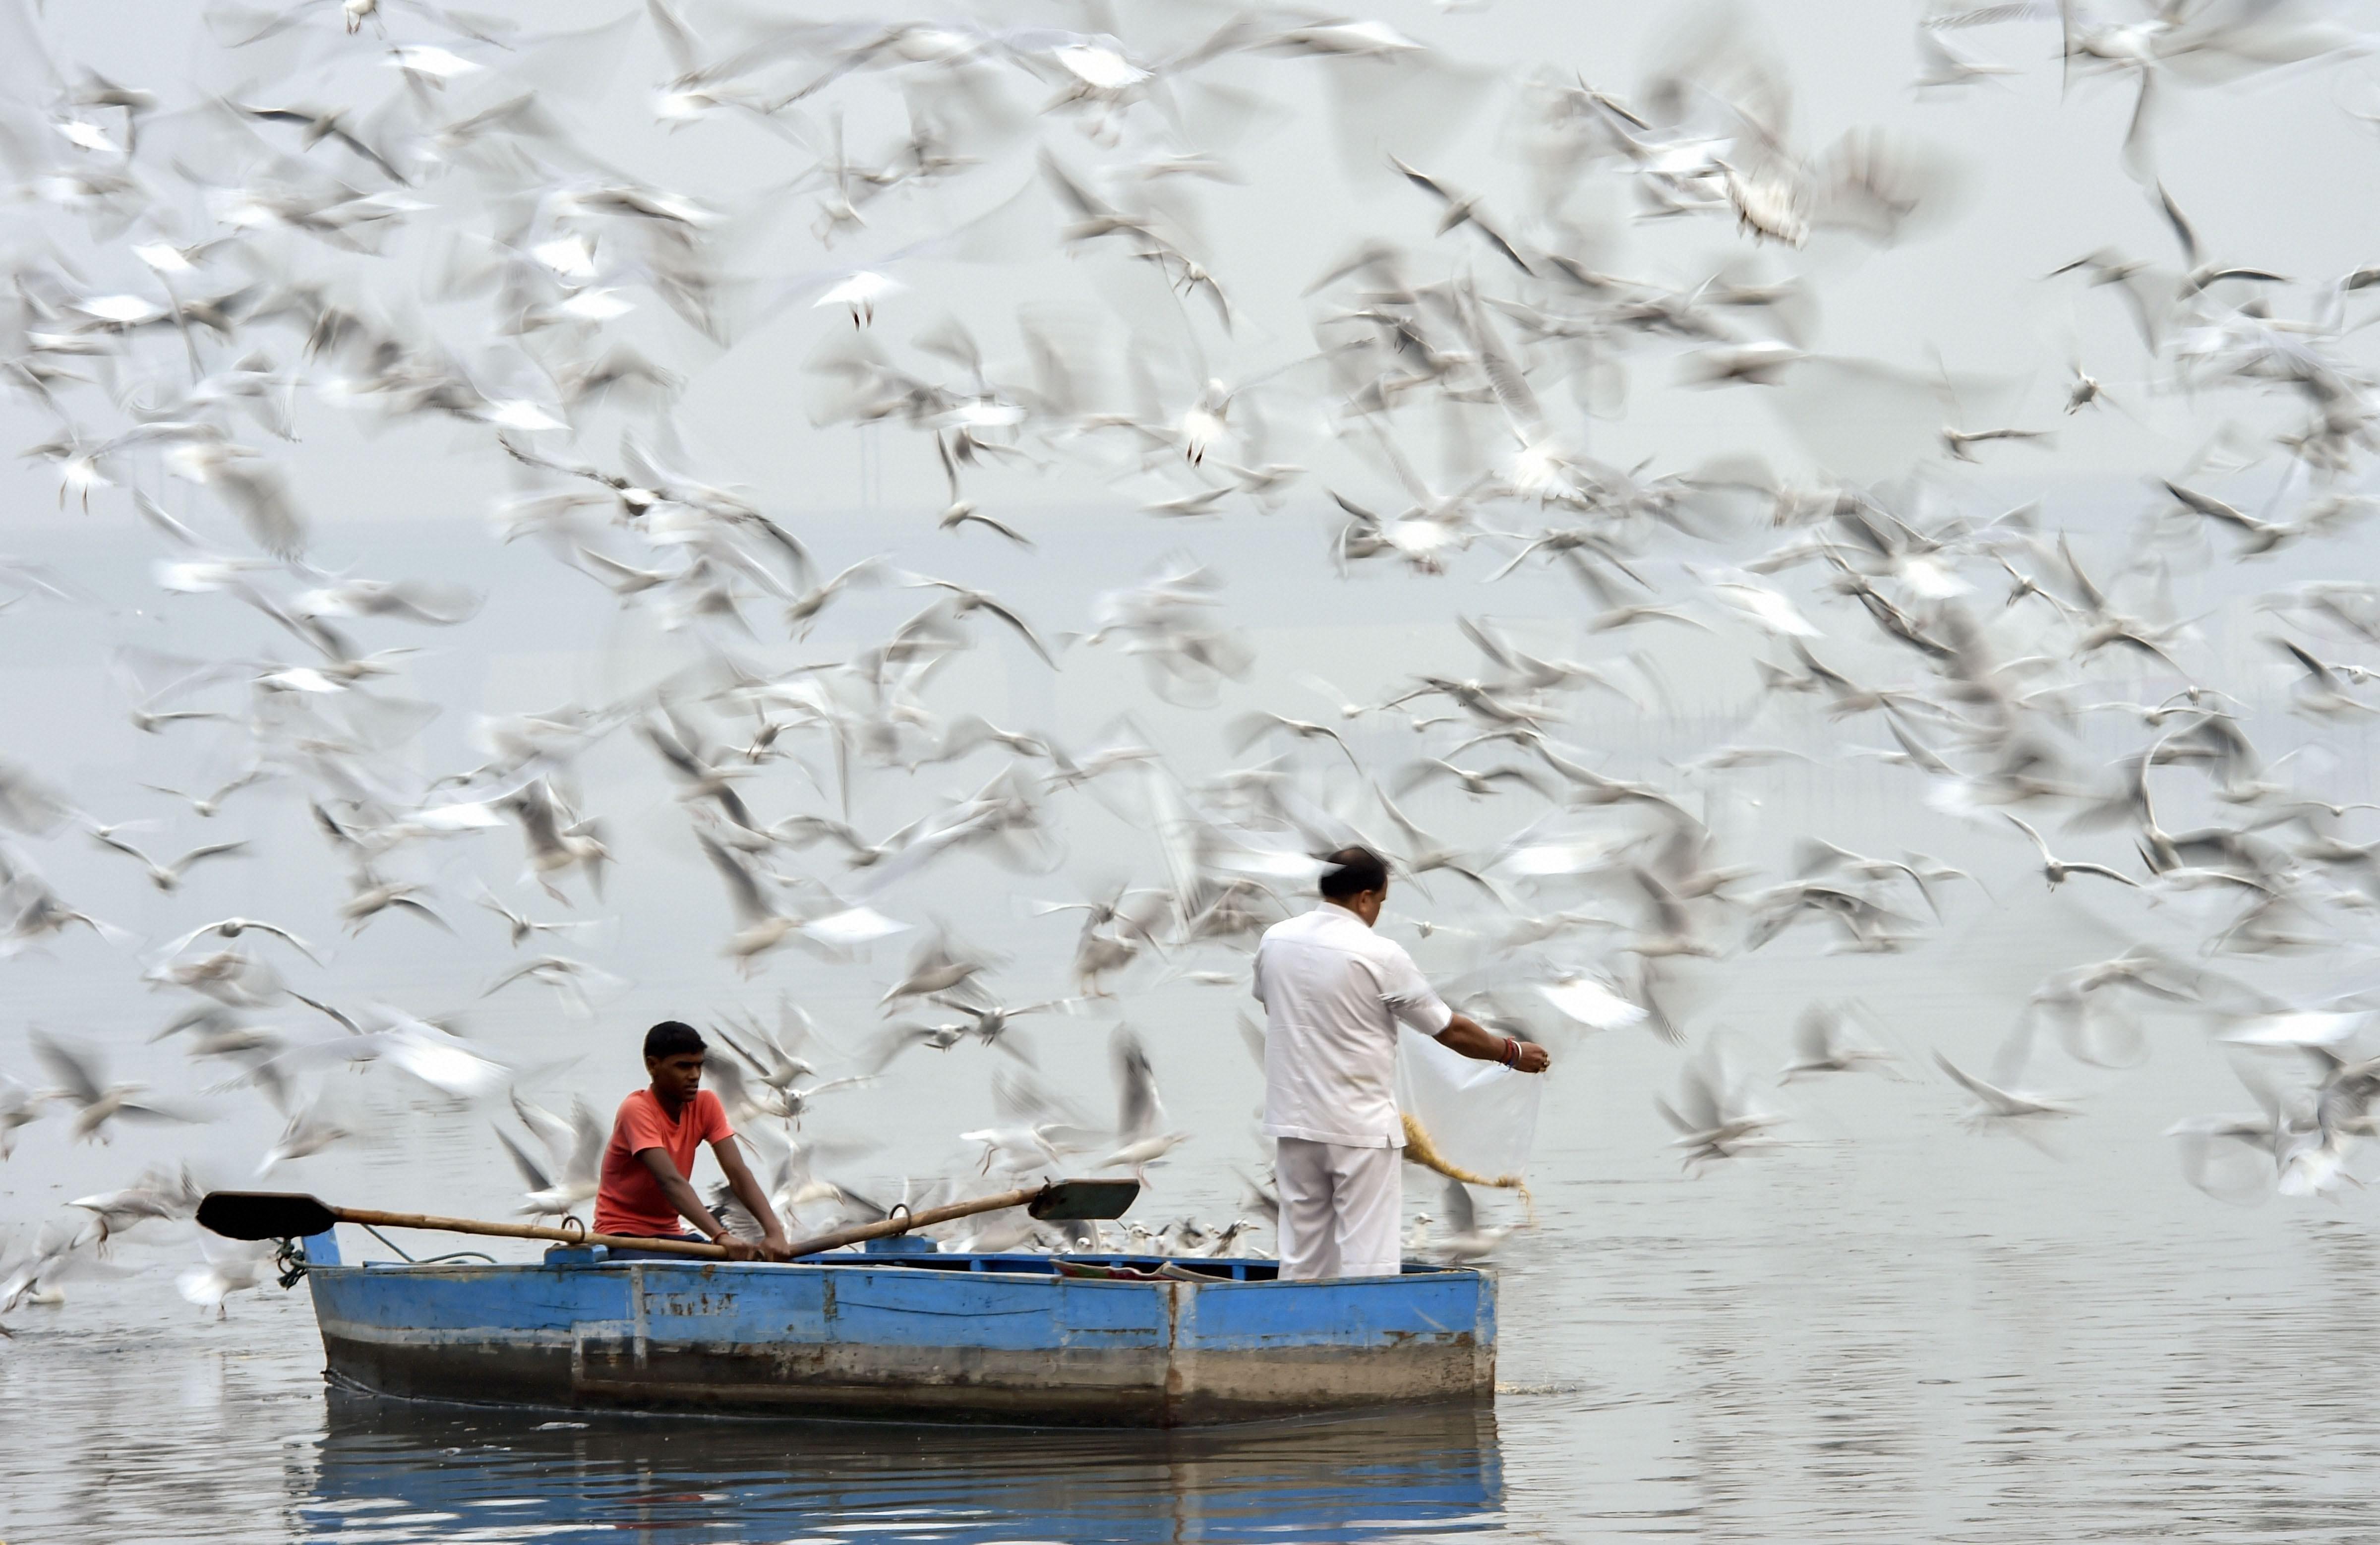 Birds fly over Ganga River on a smoggy morning, in Prayagraj, Monday, November 4, 2019.